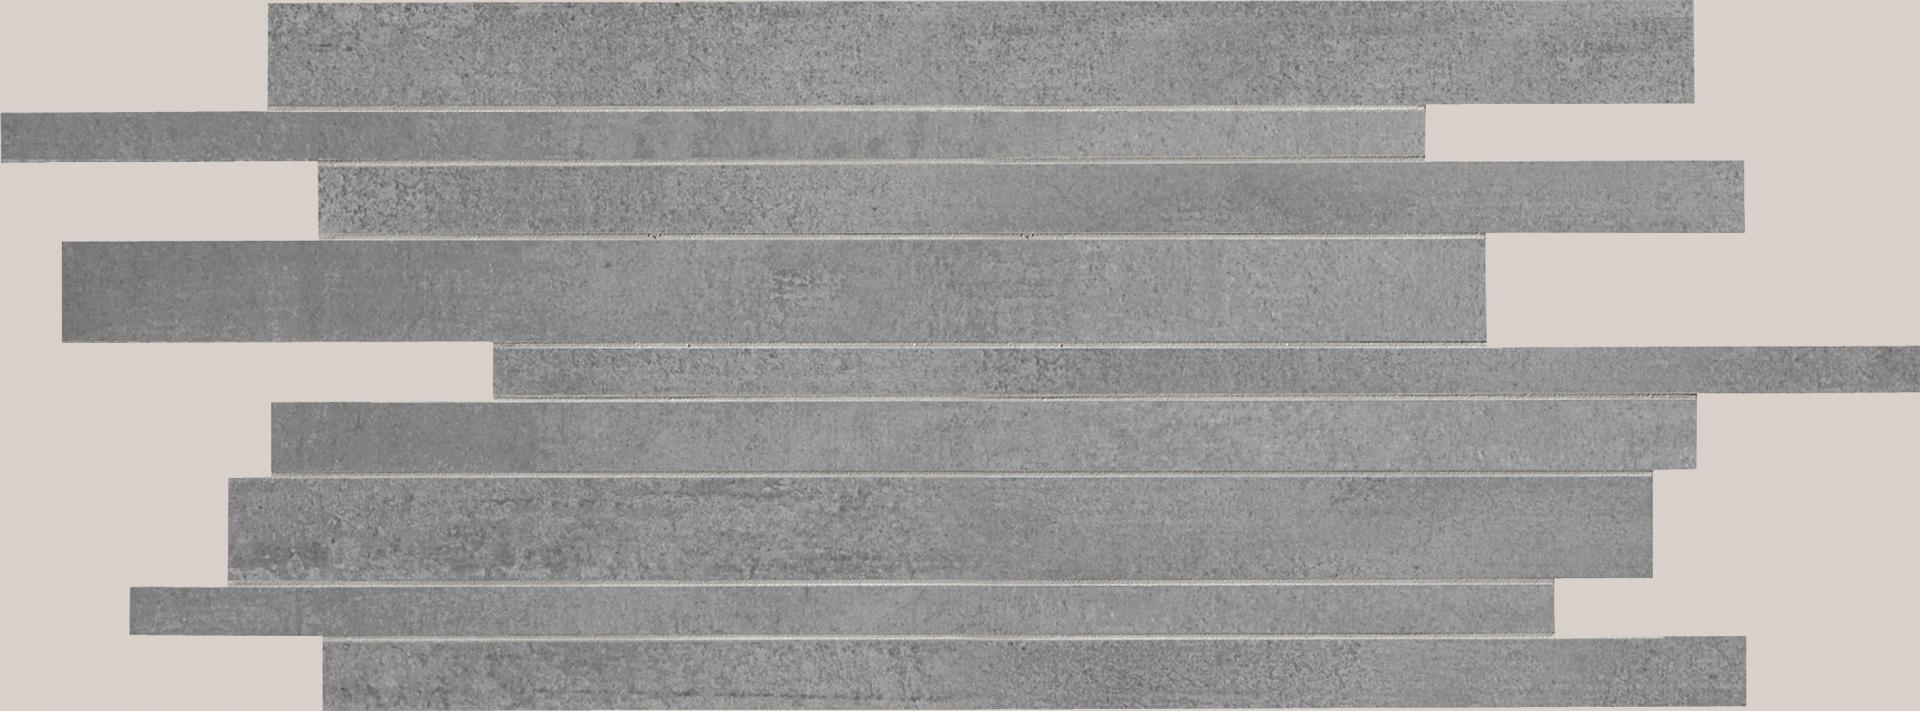 Keope LINK SLATE GREY KE-t2t4 Strips 30X60 naturale R9